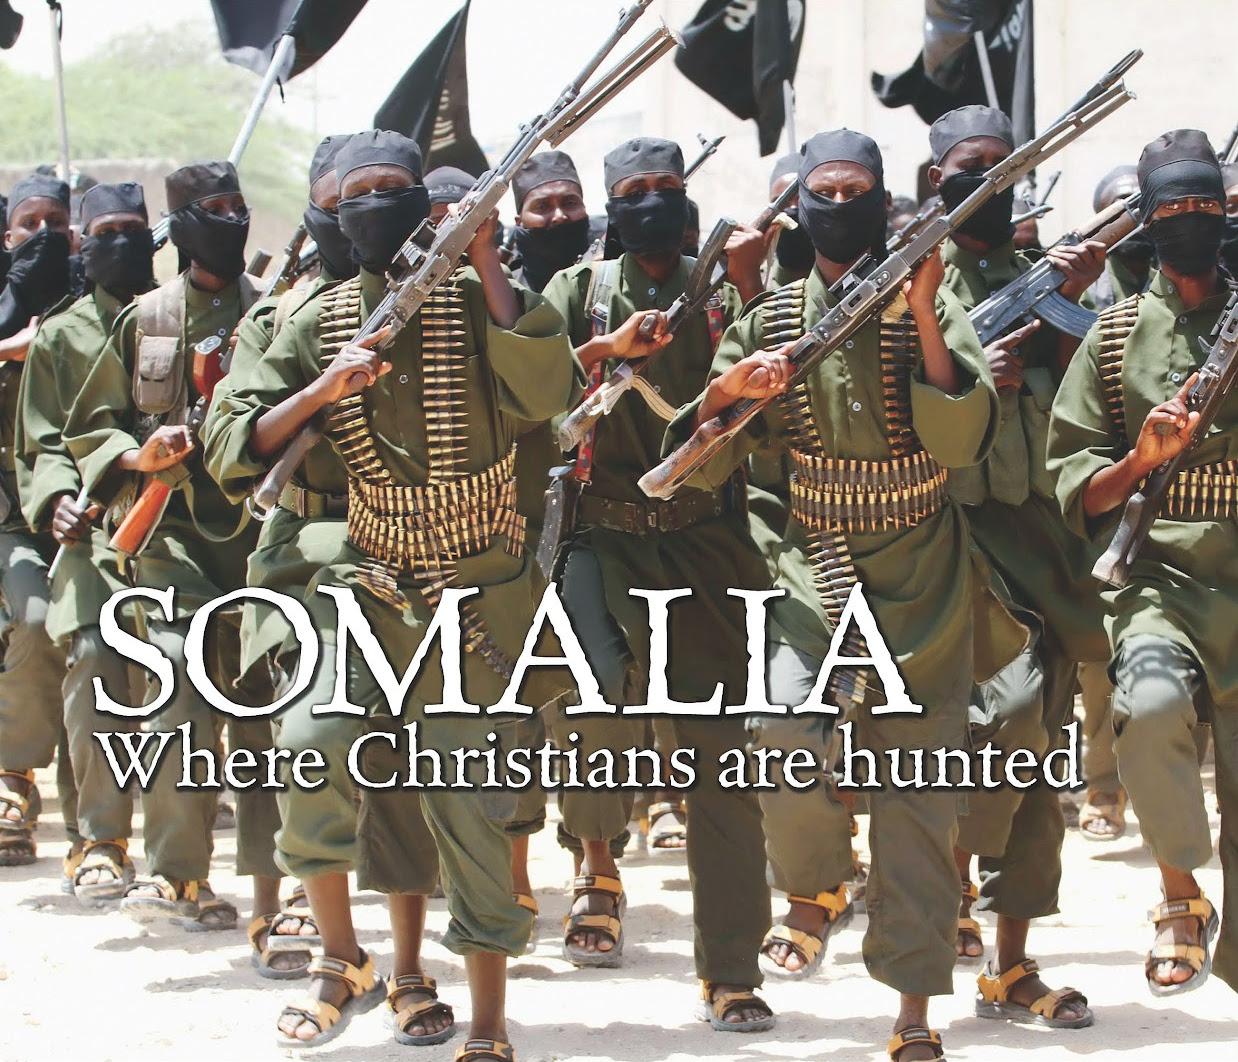 Somalia enters freefall following ISIS, al-Shabaab flurry